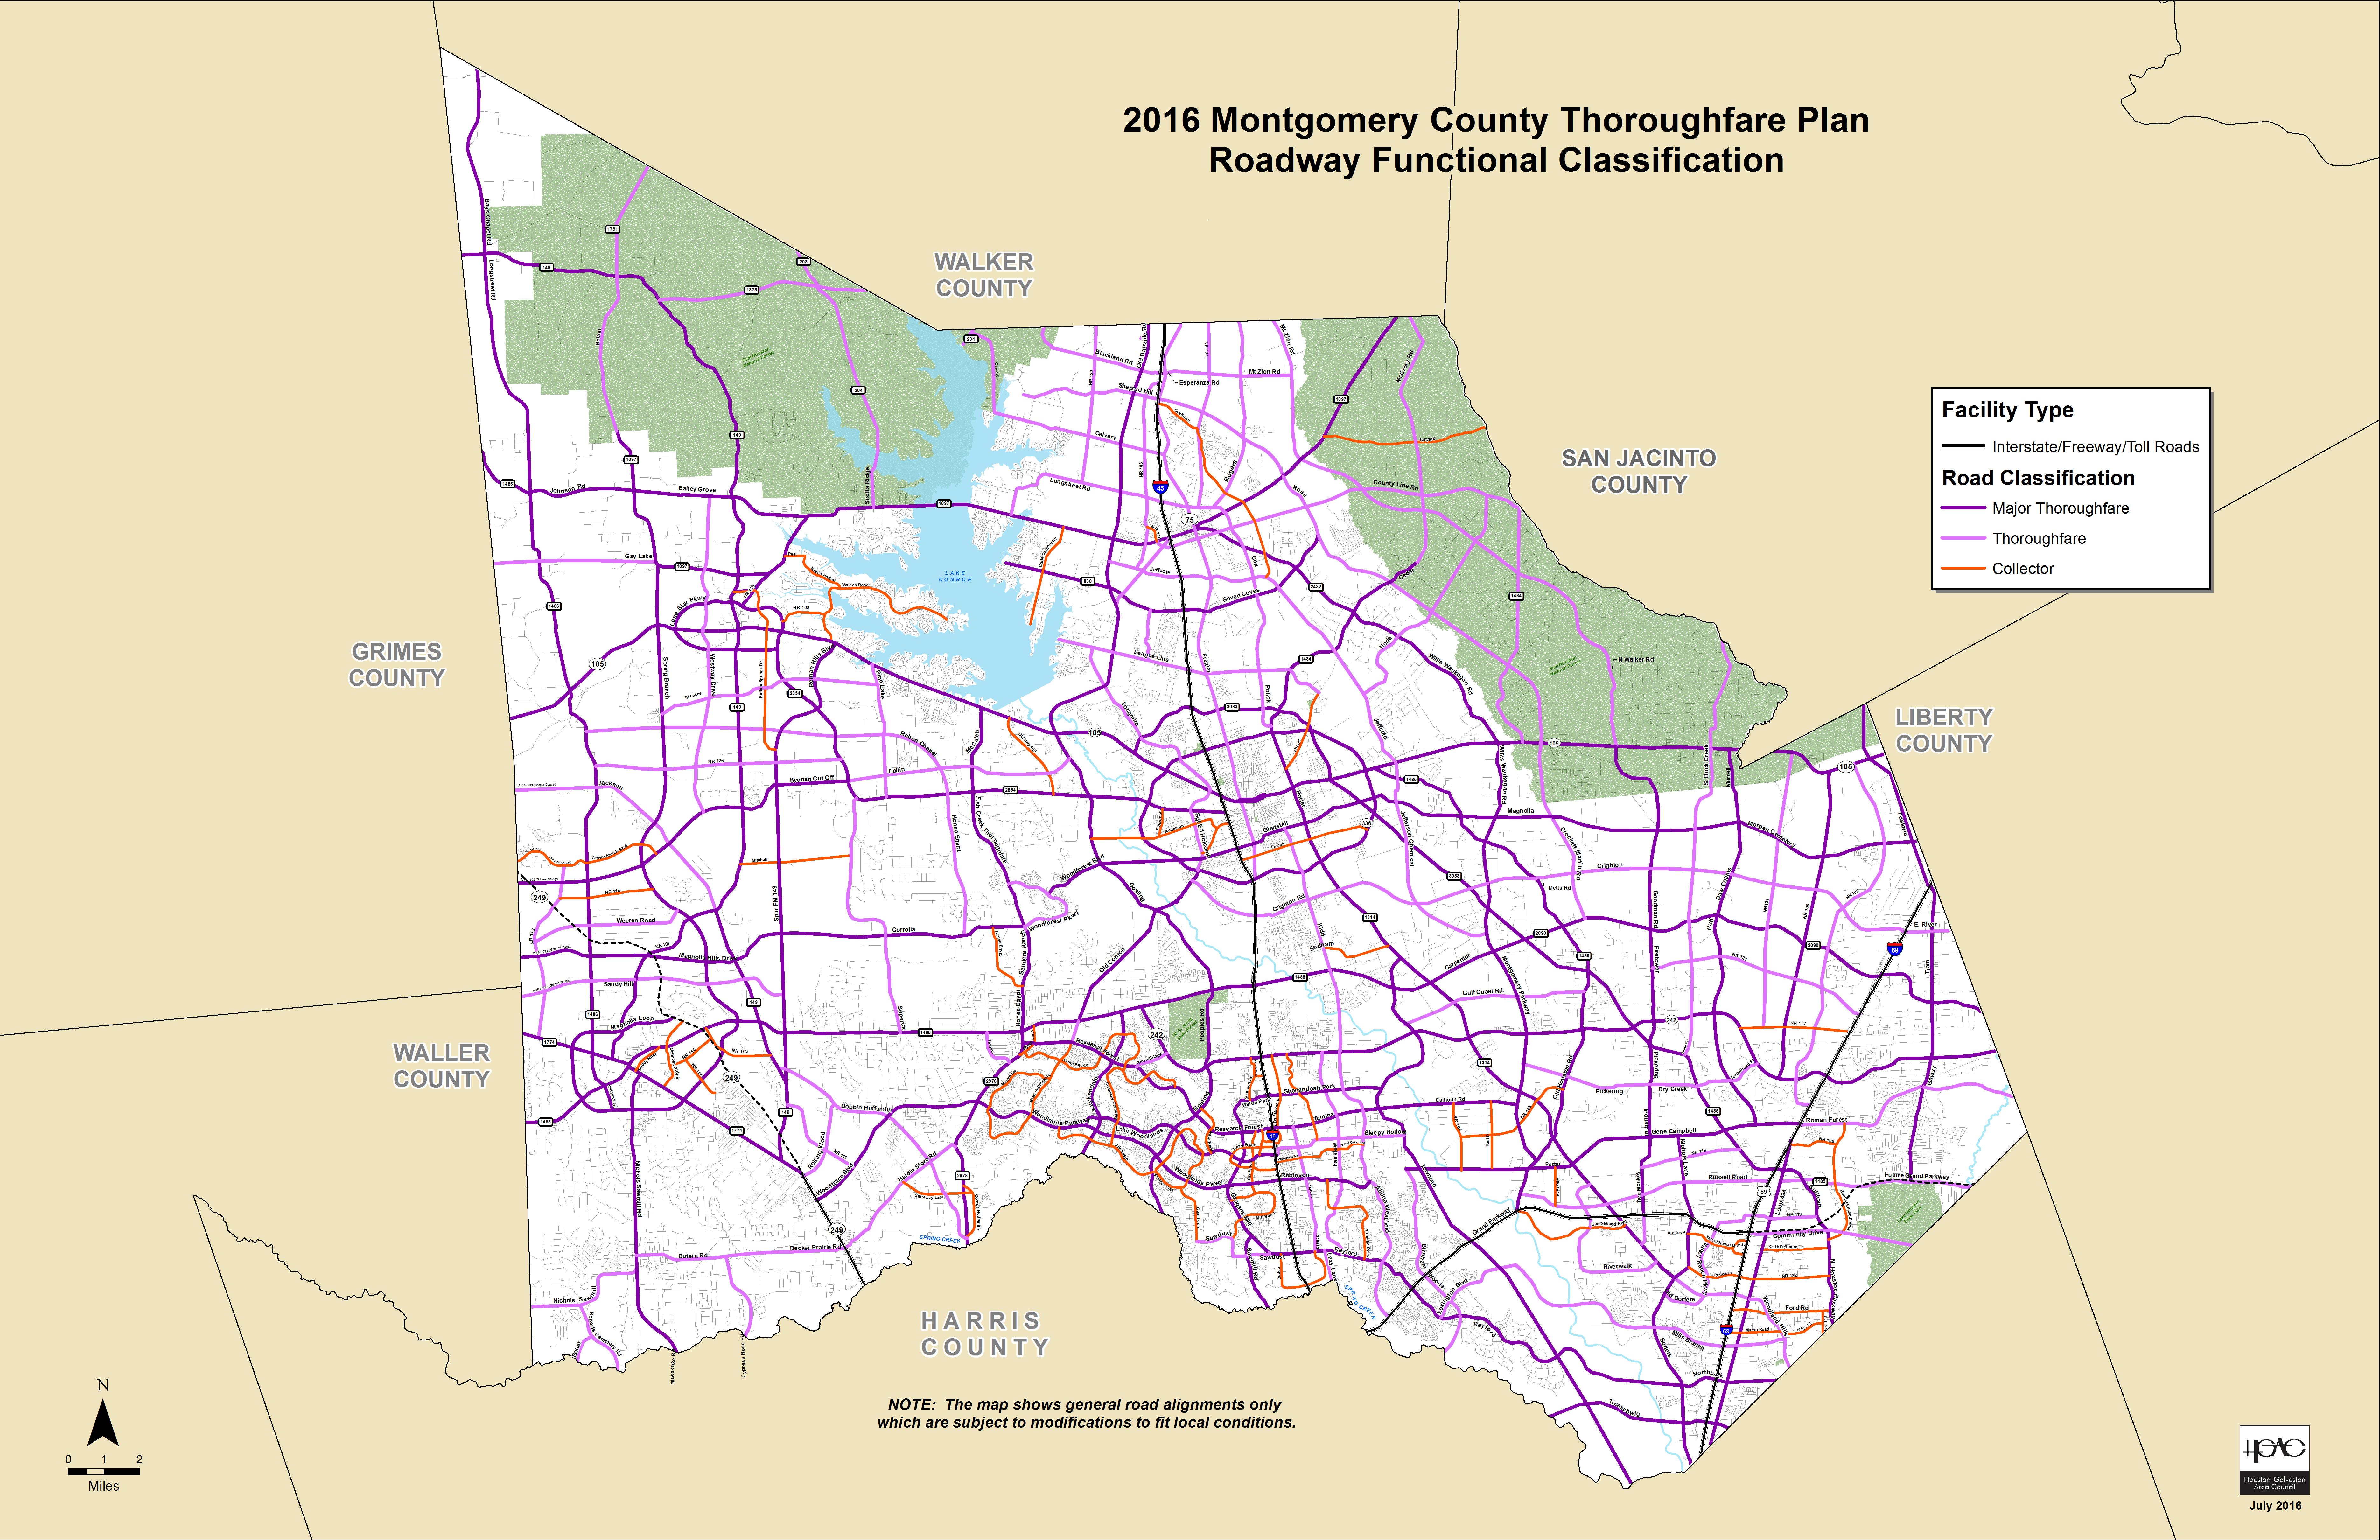 Fema Floodplain Maps Dfirm Federal Emergency Management Agency - Texas Flood Insurance Map